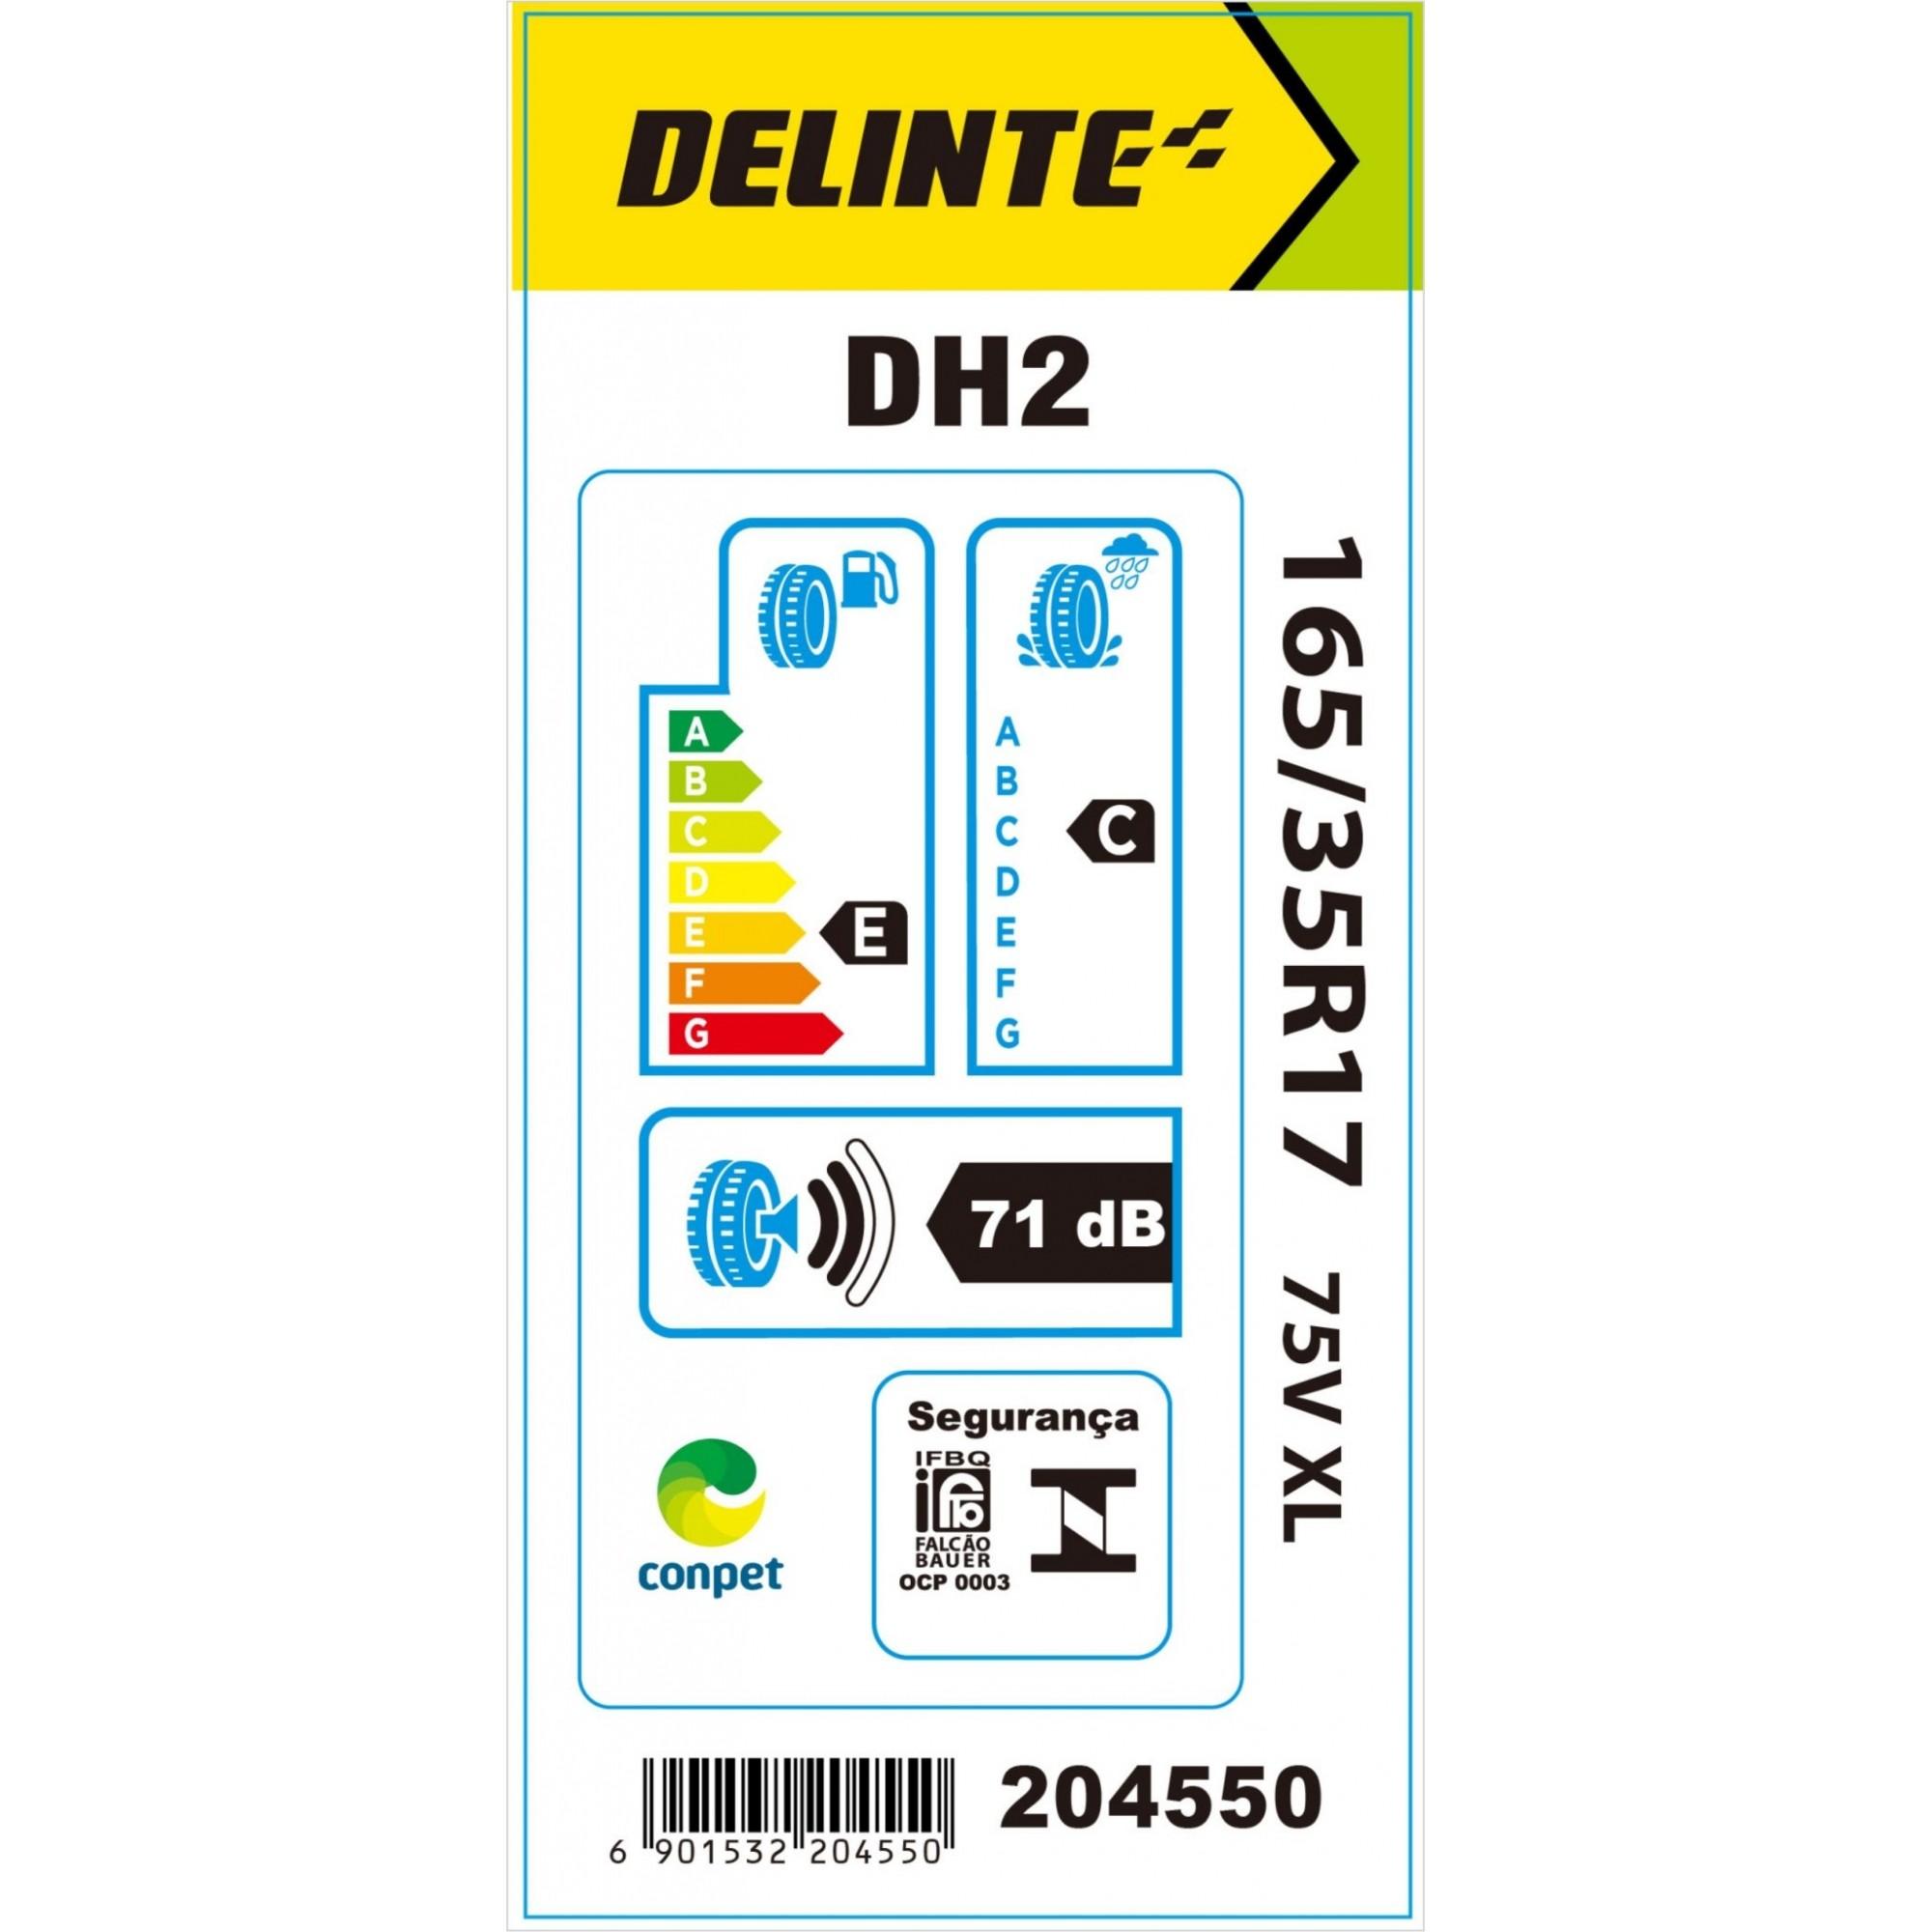 Kit 4 Pneus Delinte Aro 17 165/35 R17 75V XL DH2